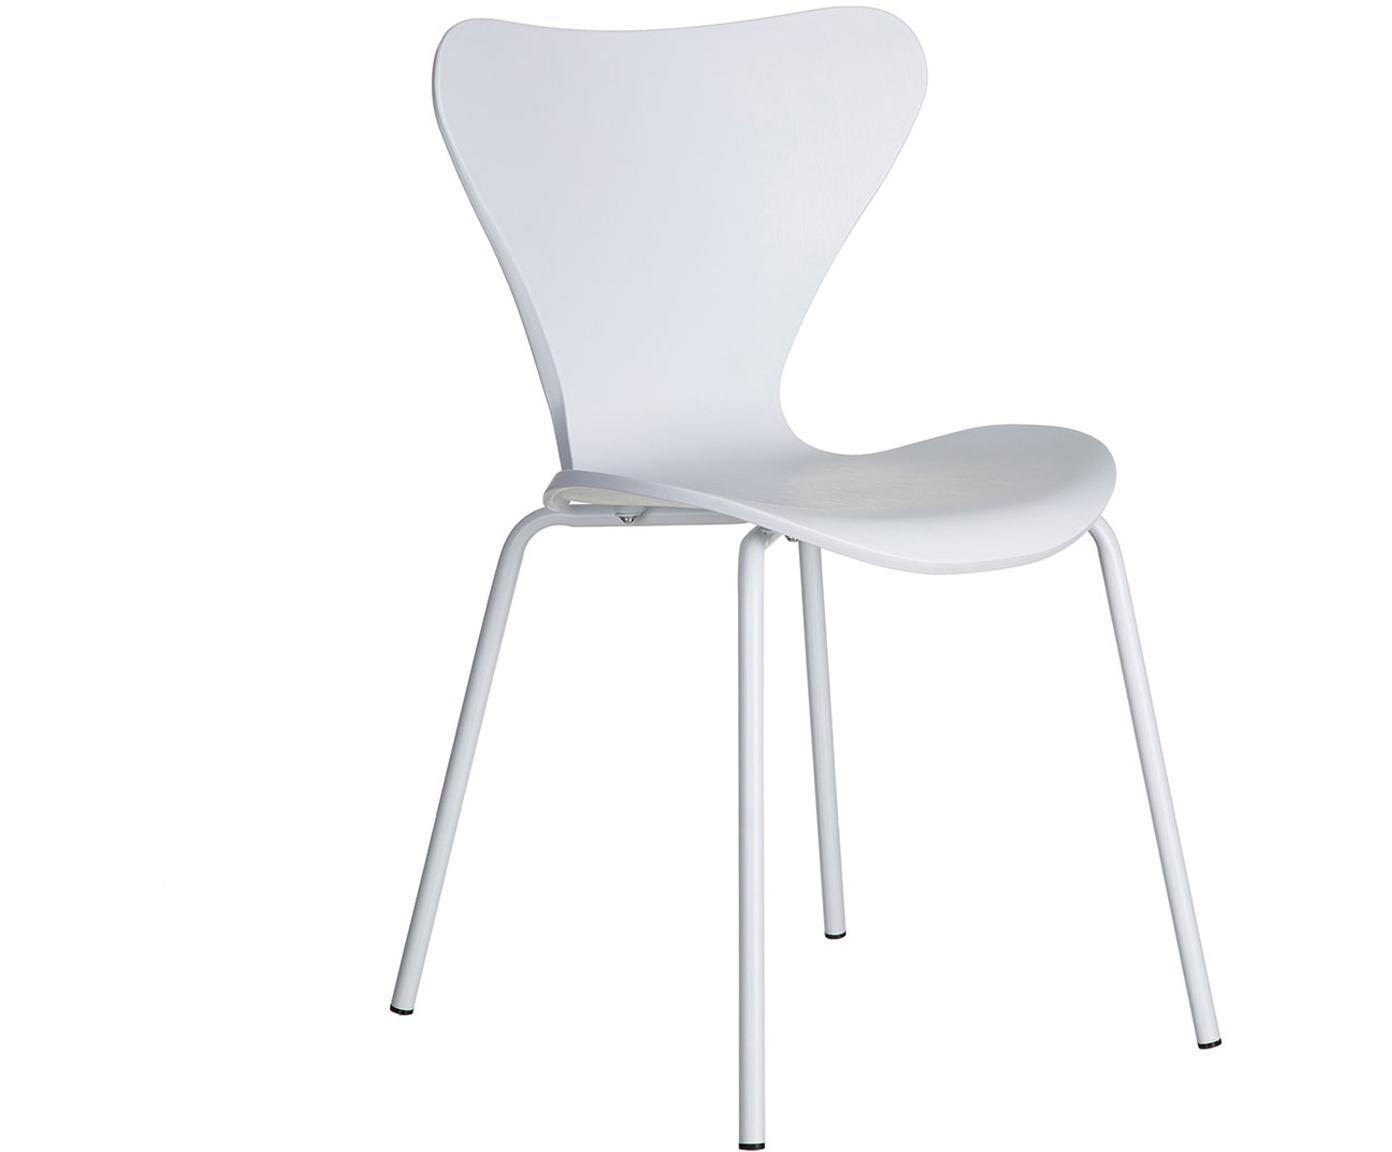 Silla Stapler, Asiento: plástico, Patas: metal, Blanco, An 47 x Al 83 cm